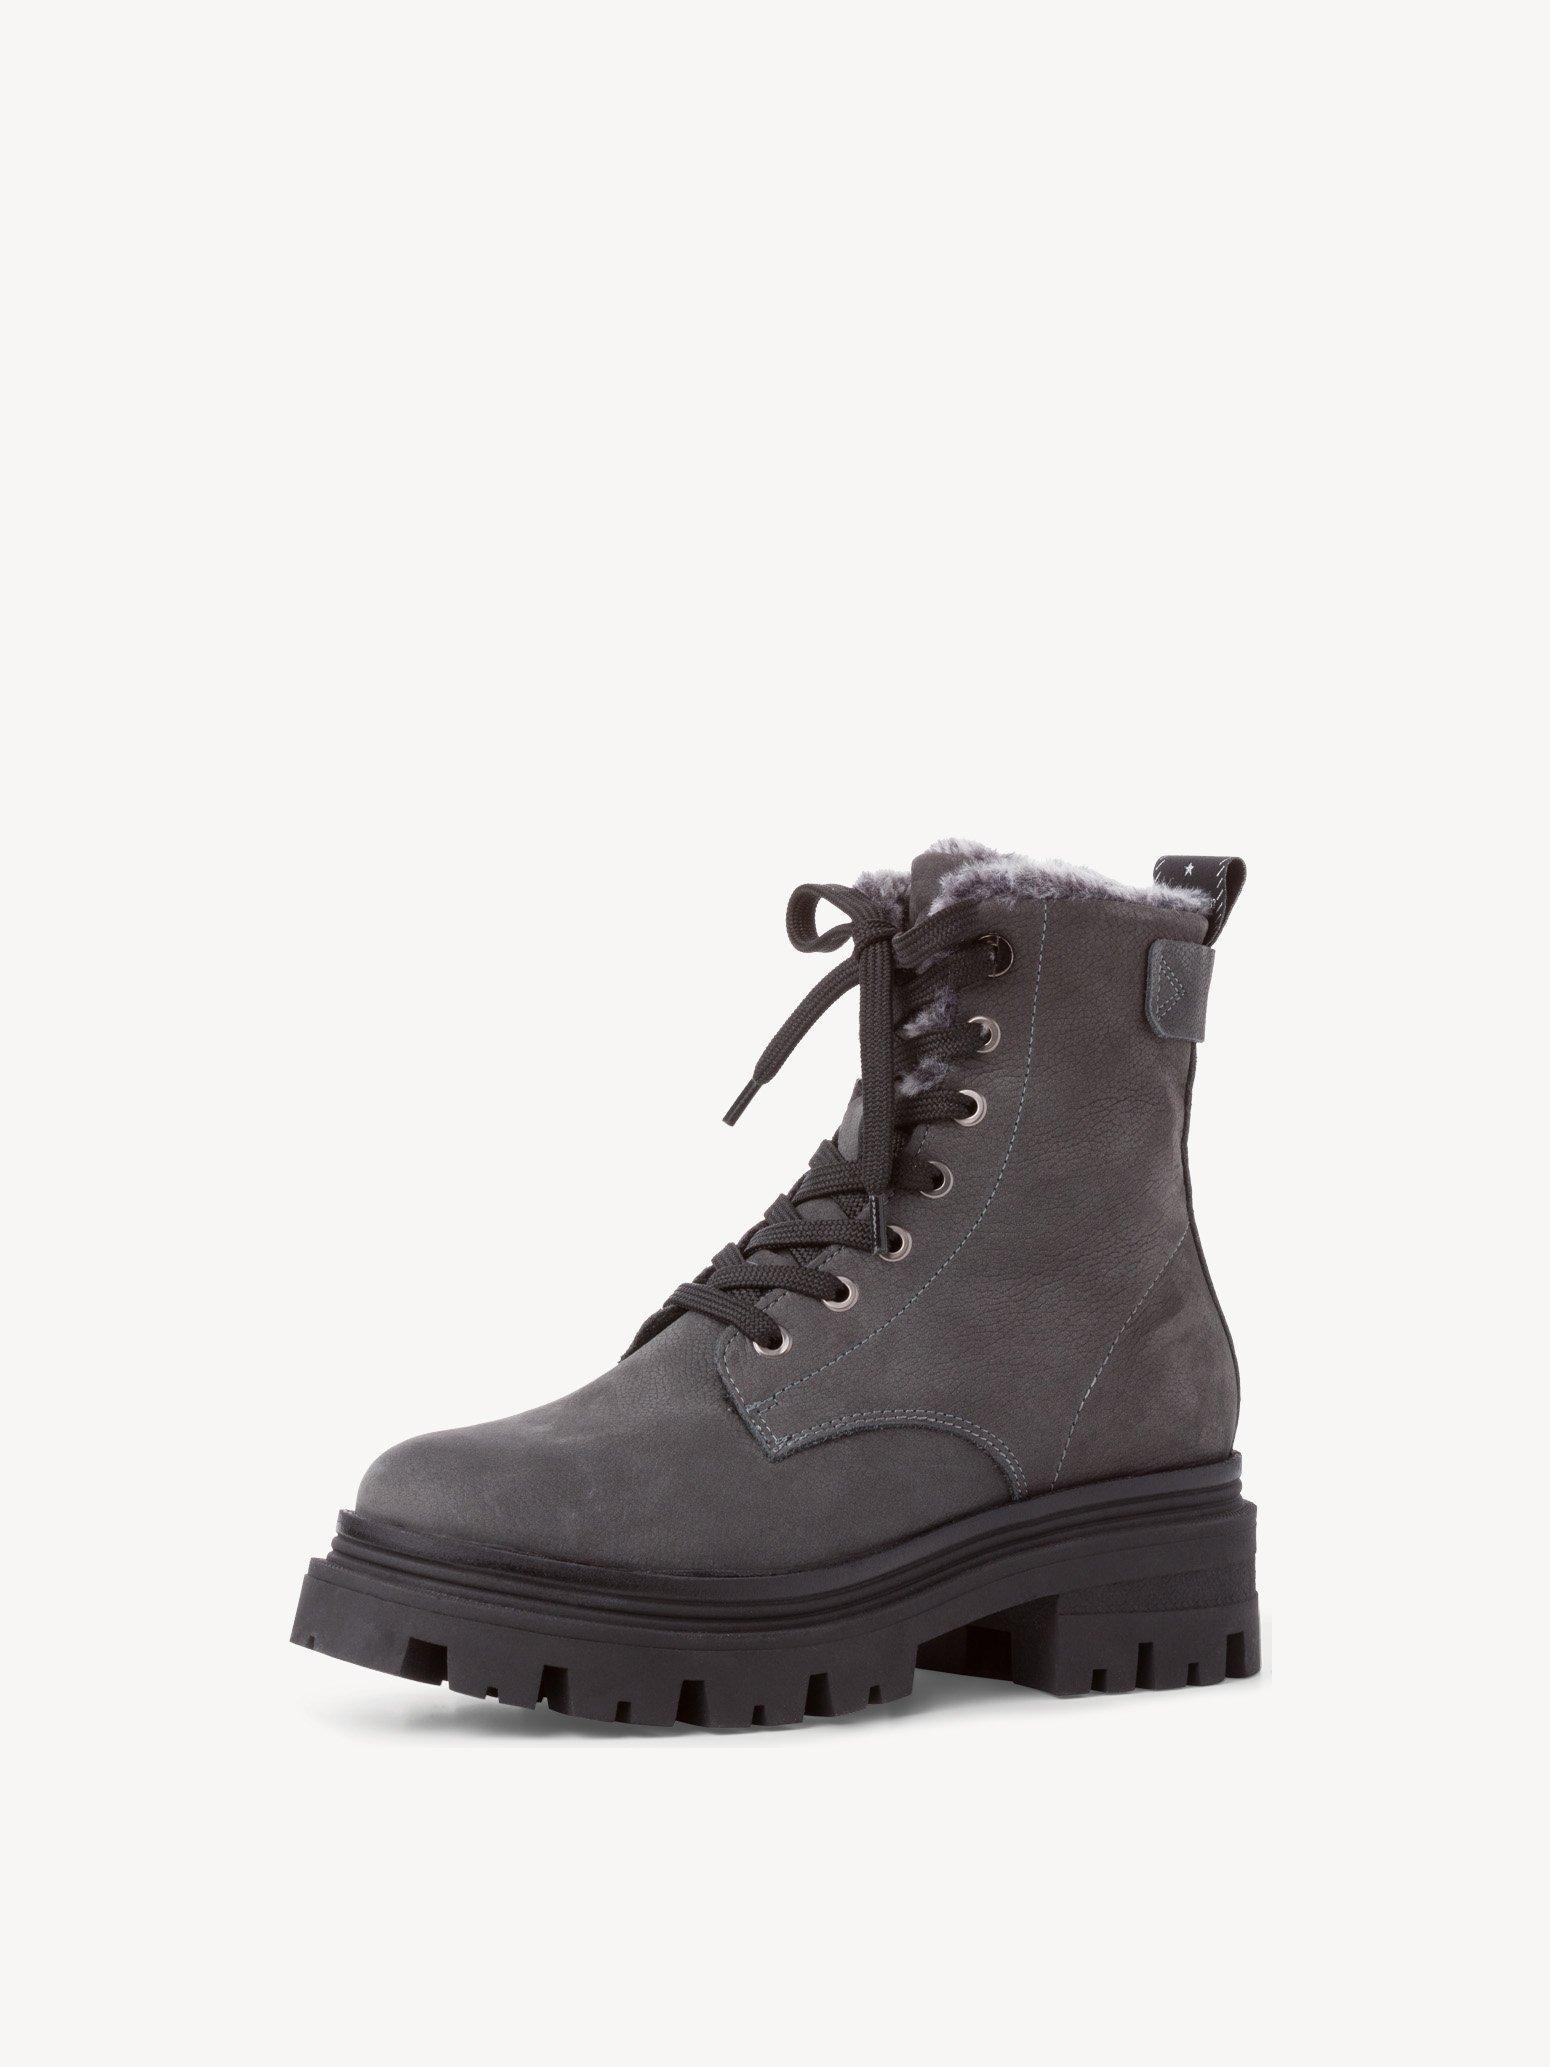 Ботинки Tamaris 1-1-26288-27-214